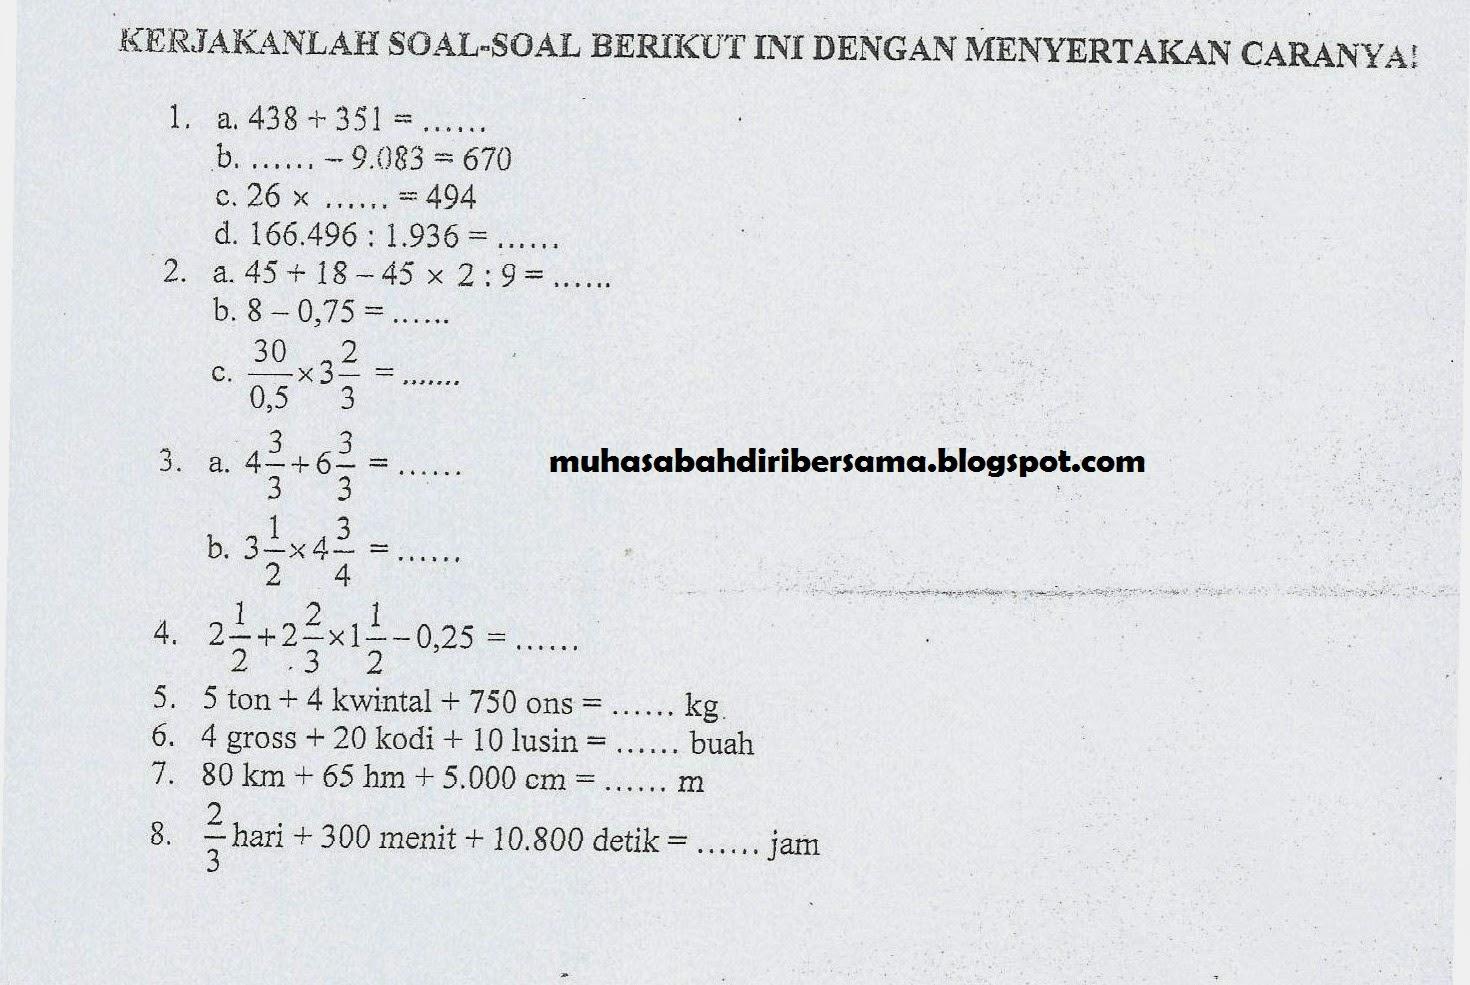 Muhasabah Diri Bersama Info Pendaftaran Pondok Gontor Bagi Pelajar Malaysia